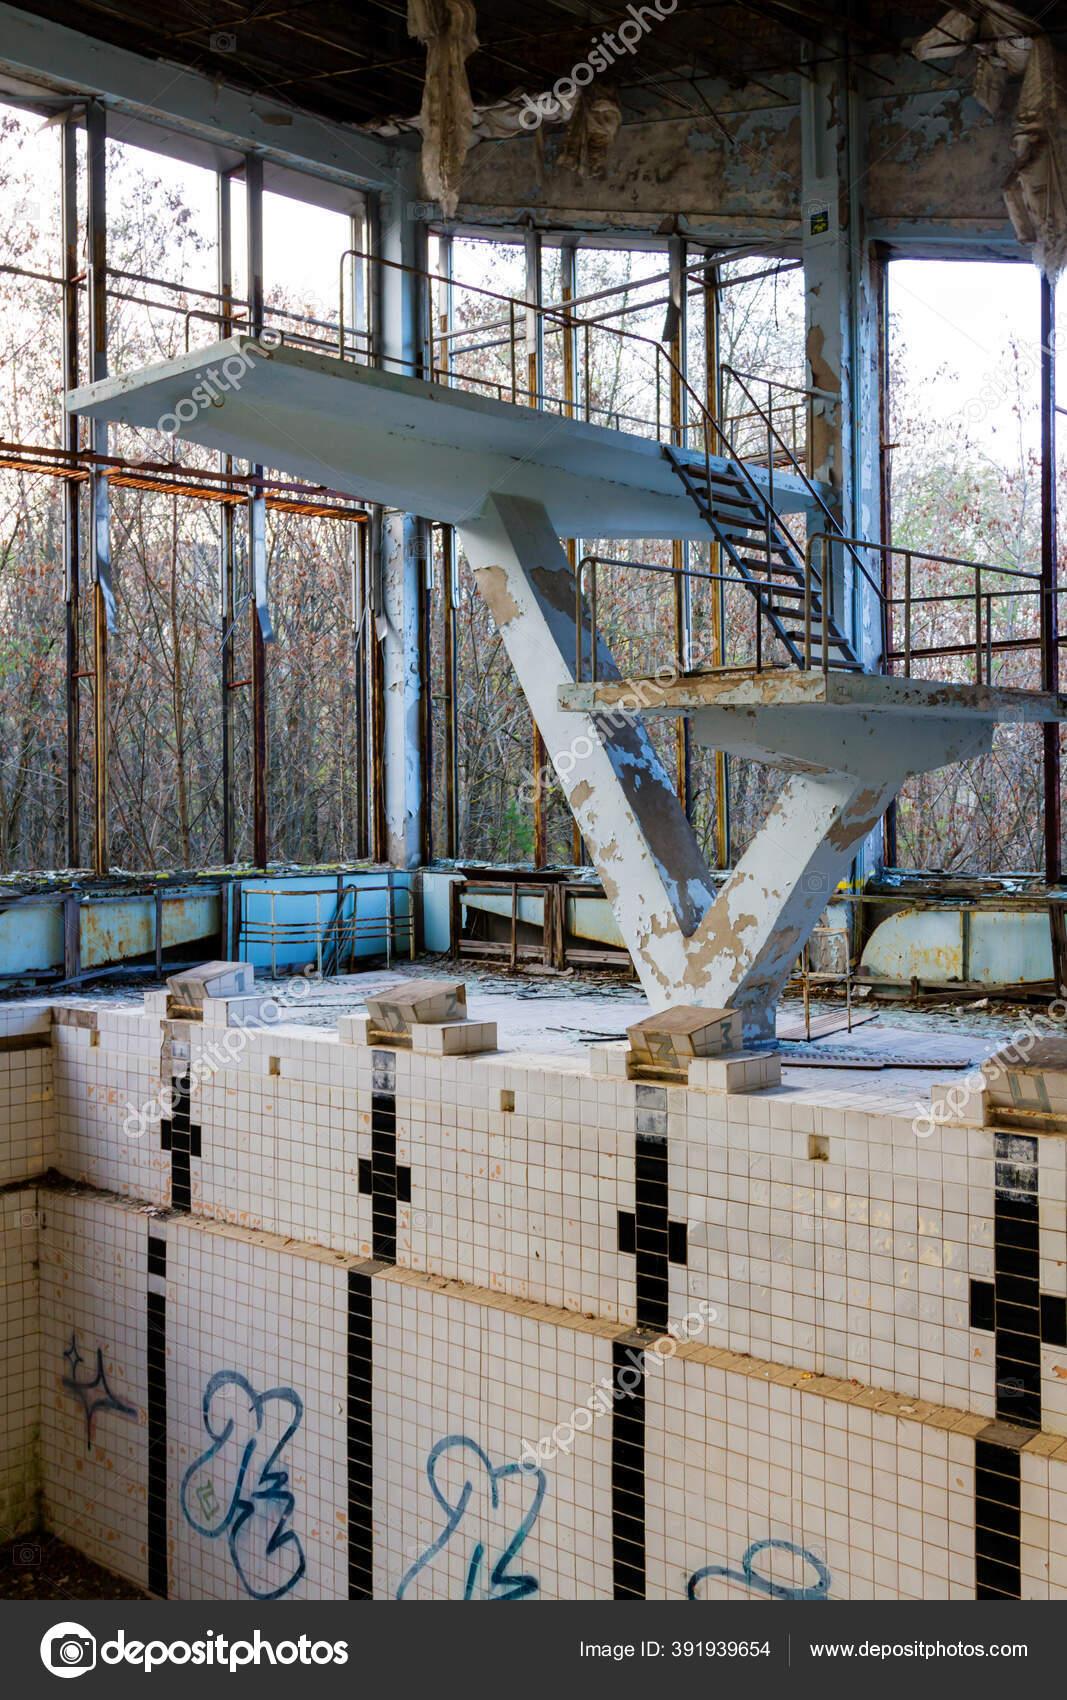 Abandoned Swimming Pool Pripyat Chernobyl Exclusion Zone Ukraine Stock Photo C Kefirm 391939654